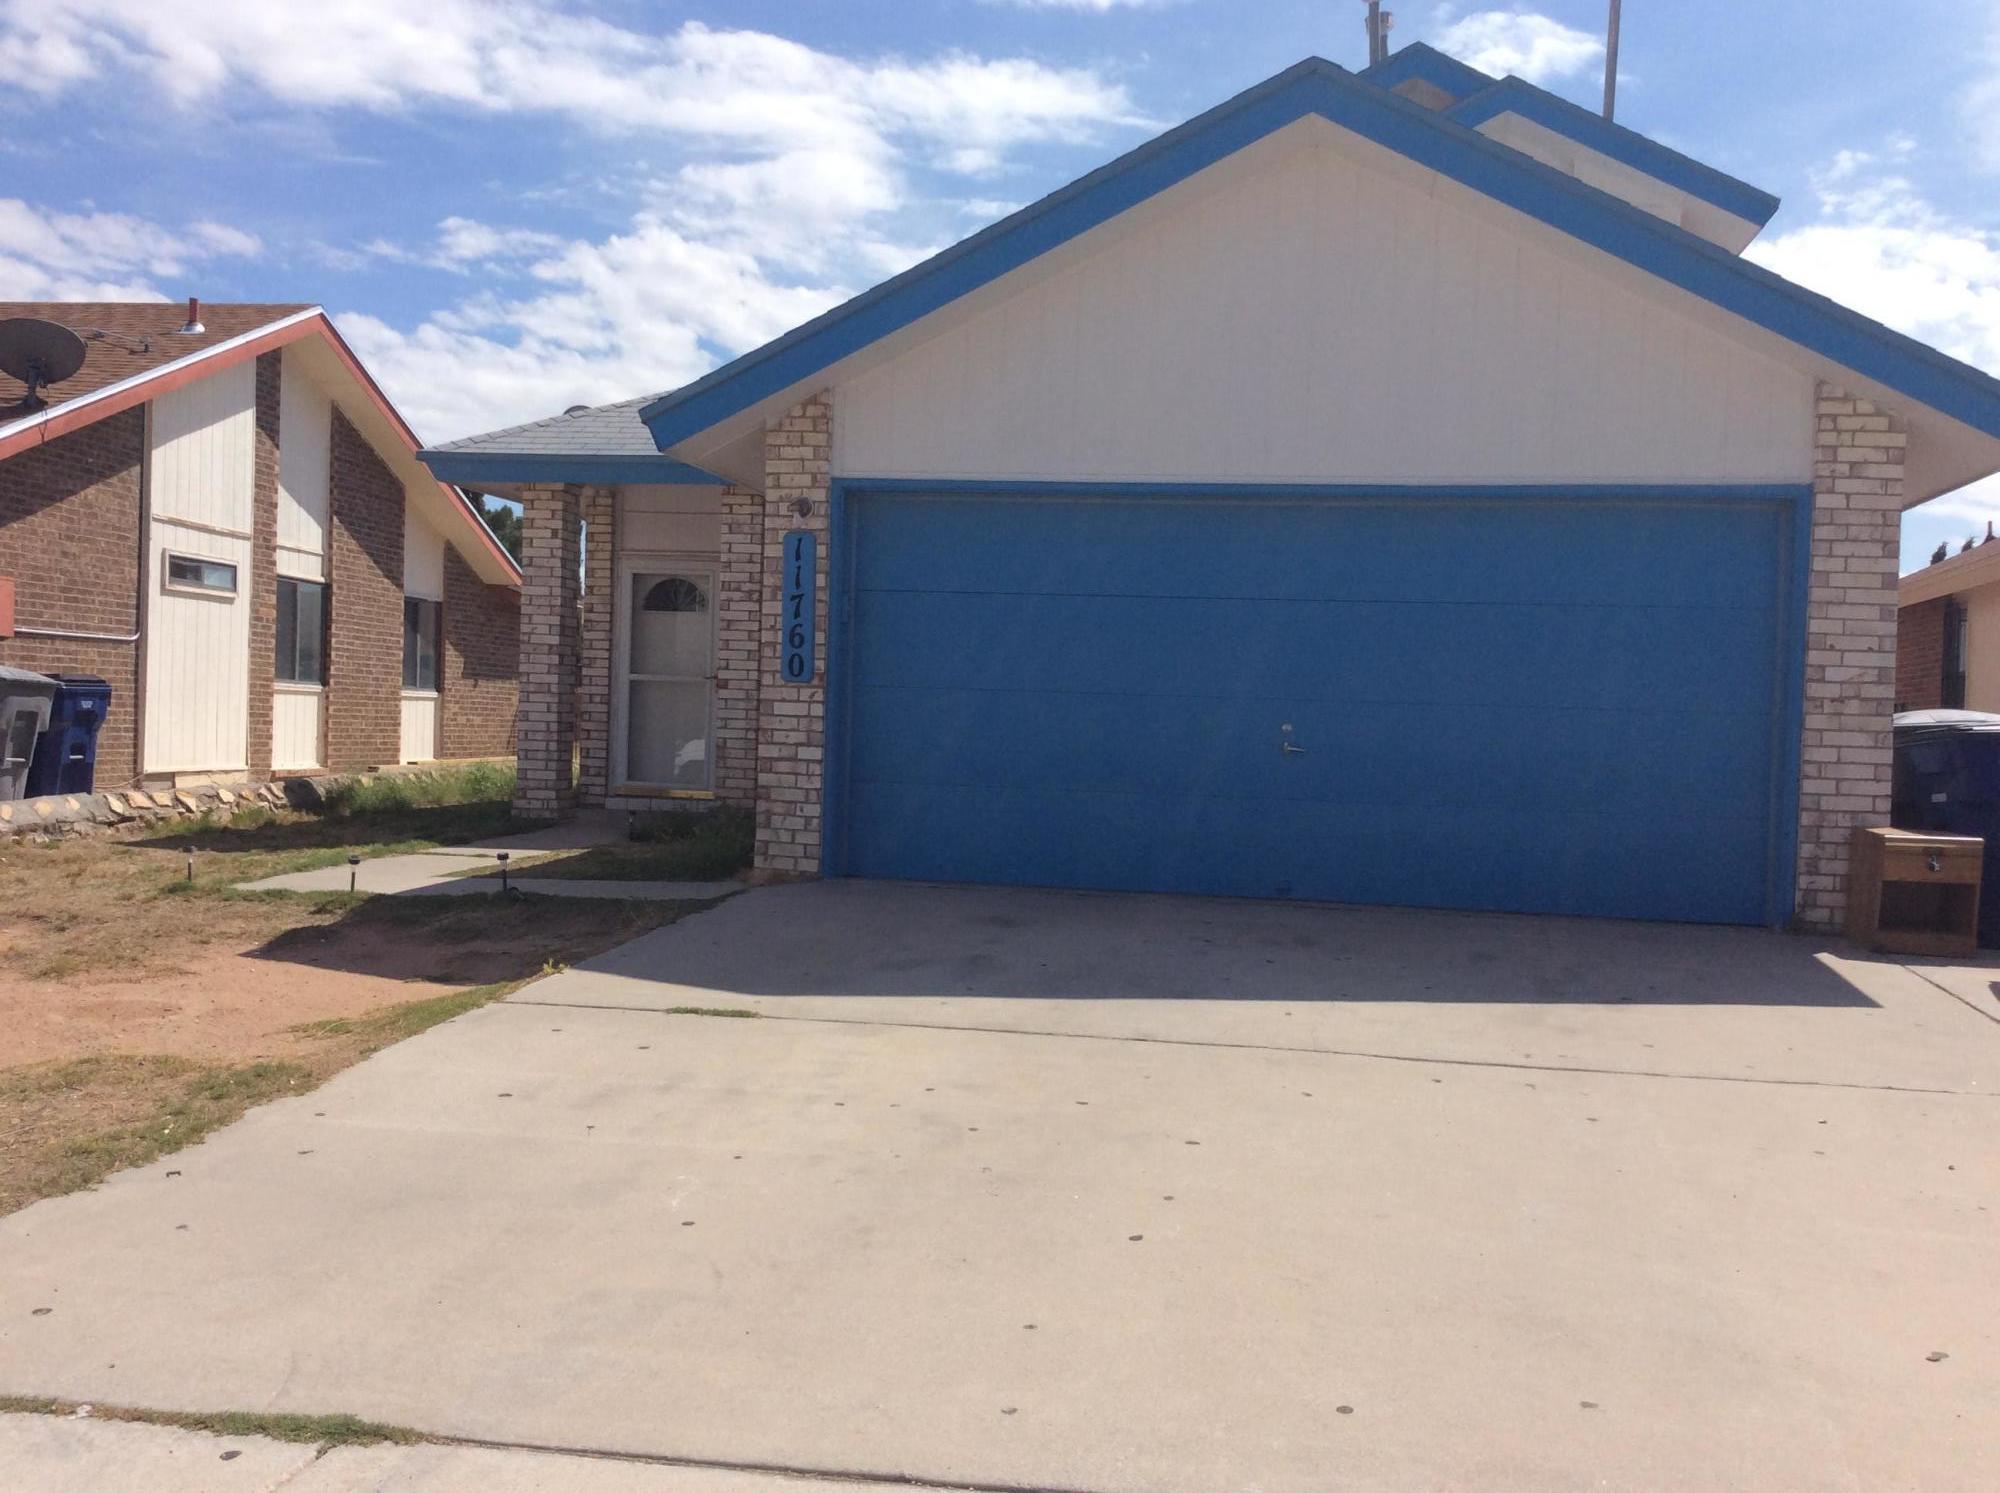 11760 ROYAL BANNER, El Paso, Texas 79936, 3 Bedrooms Bedrooms, ,2 BathroomsBathrooms,Residential,For sale,ROYAL BANNER,834395